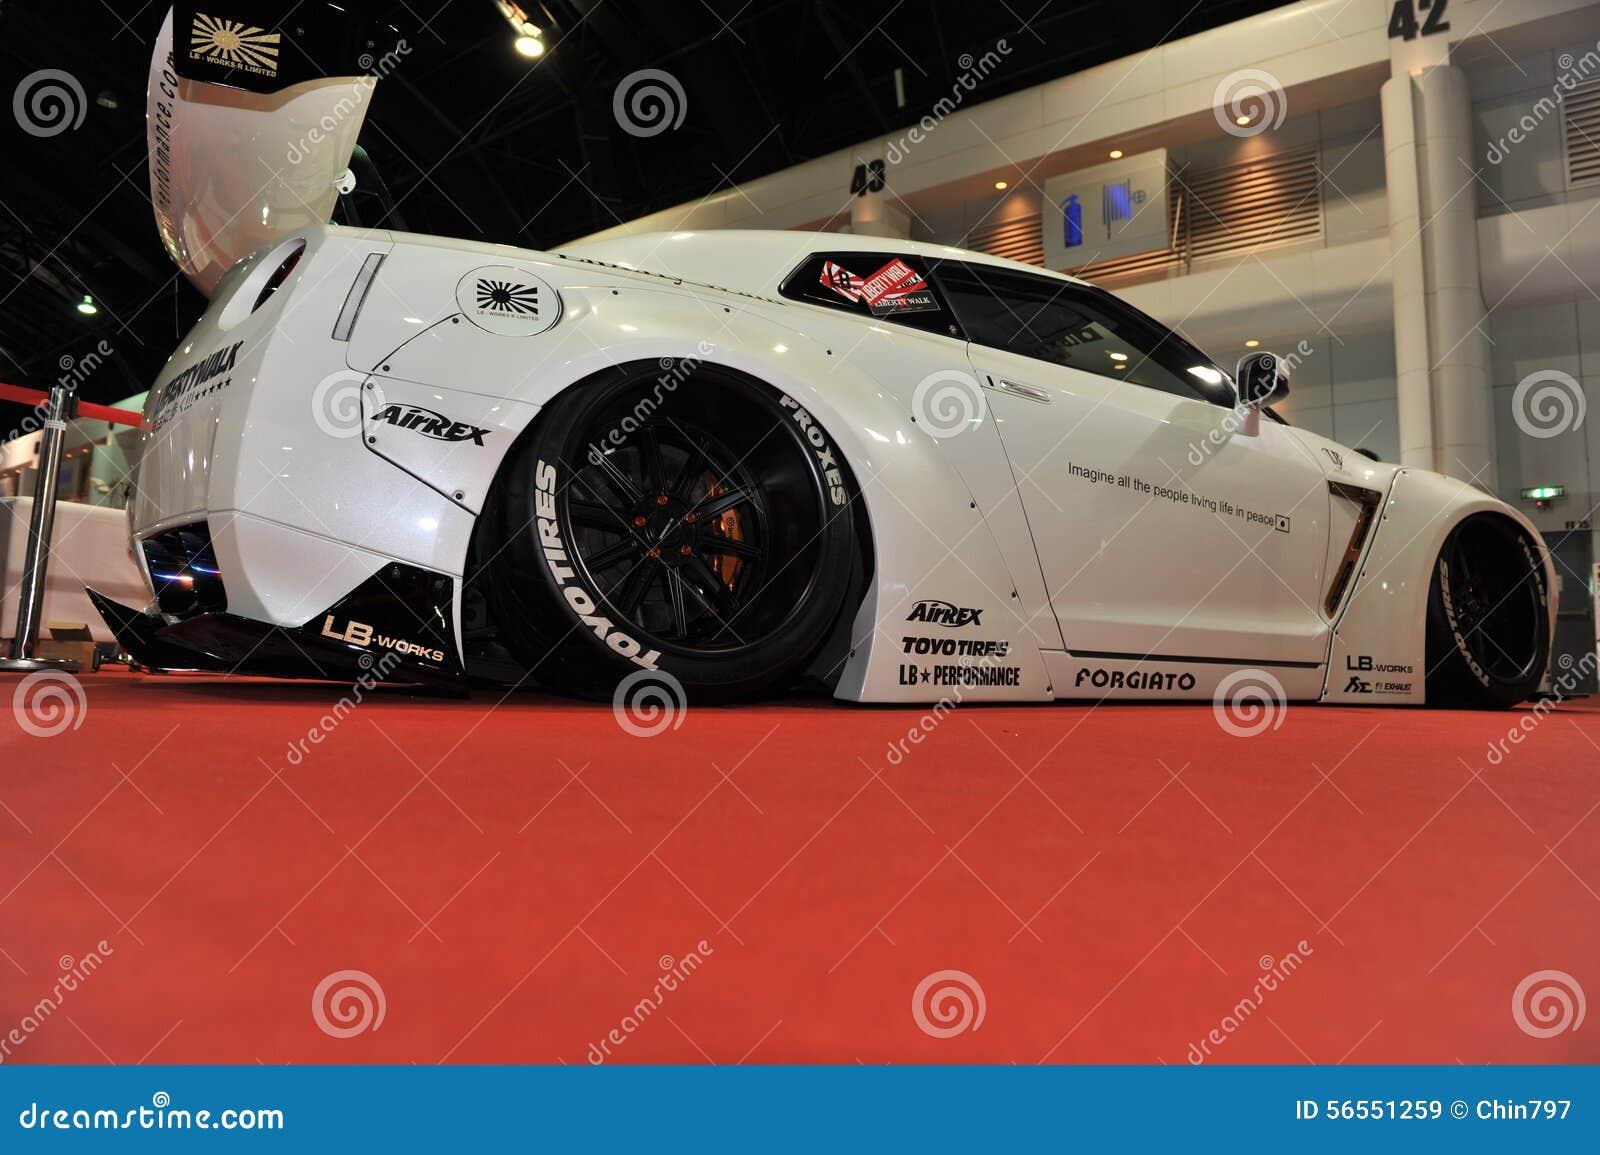 Download Αυτοκίνητο οριζόντων R35 GT-ρ της Nissan στο 3$ο διεθνές Autosalon 2015 της Μπανγκόκ στις 27 Ιουνίου 2015 στη Μπανγκόκ, Thailan Εκδοτική Στοκ Εικόνα - εικόνα από makeup, γεγονός: 56551259